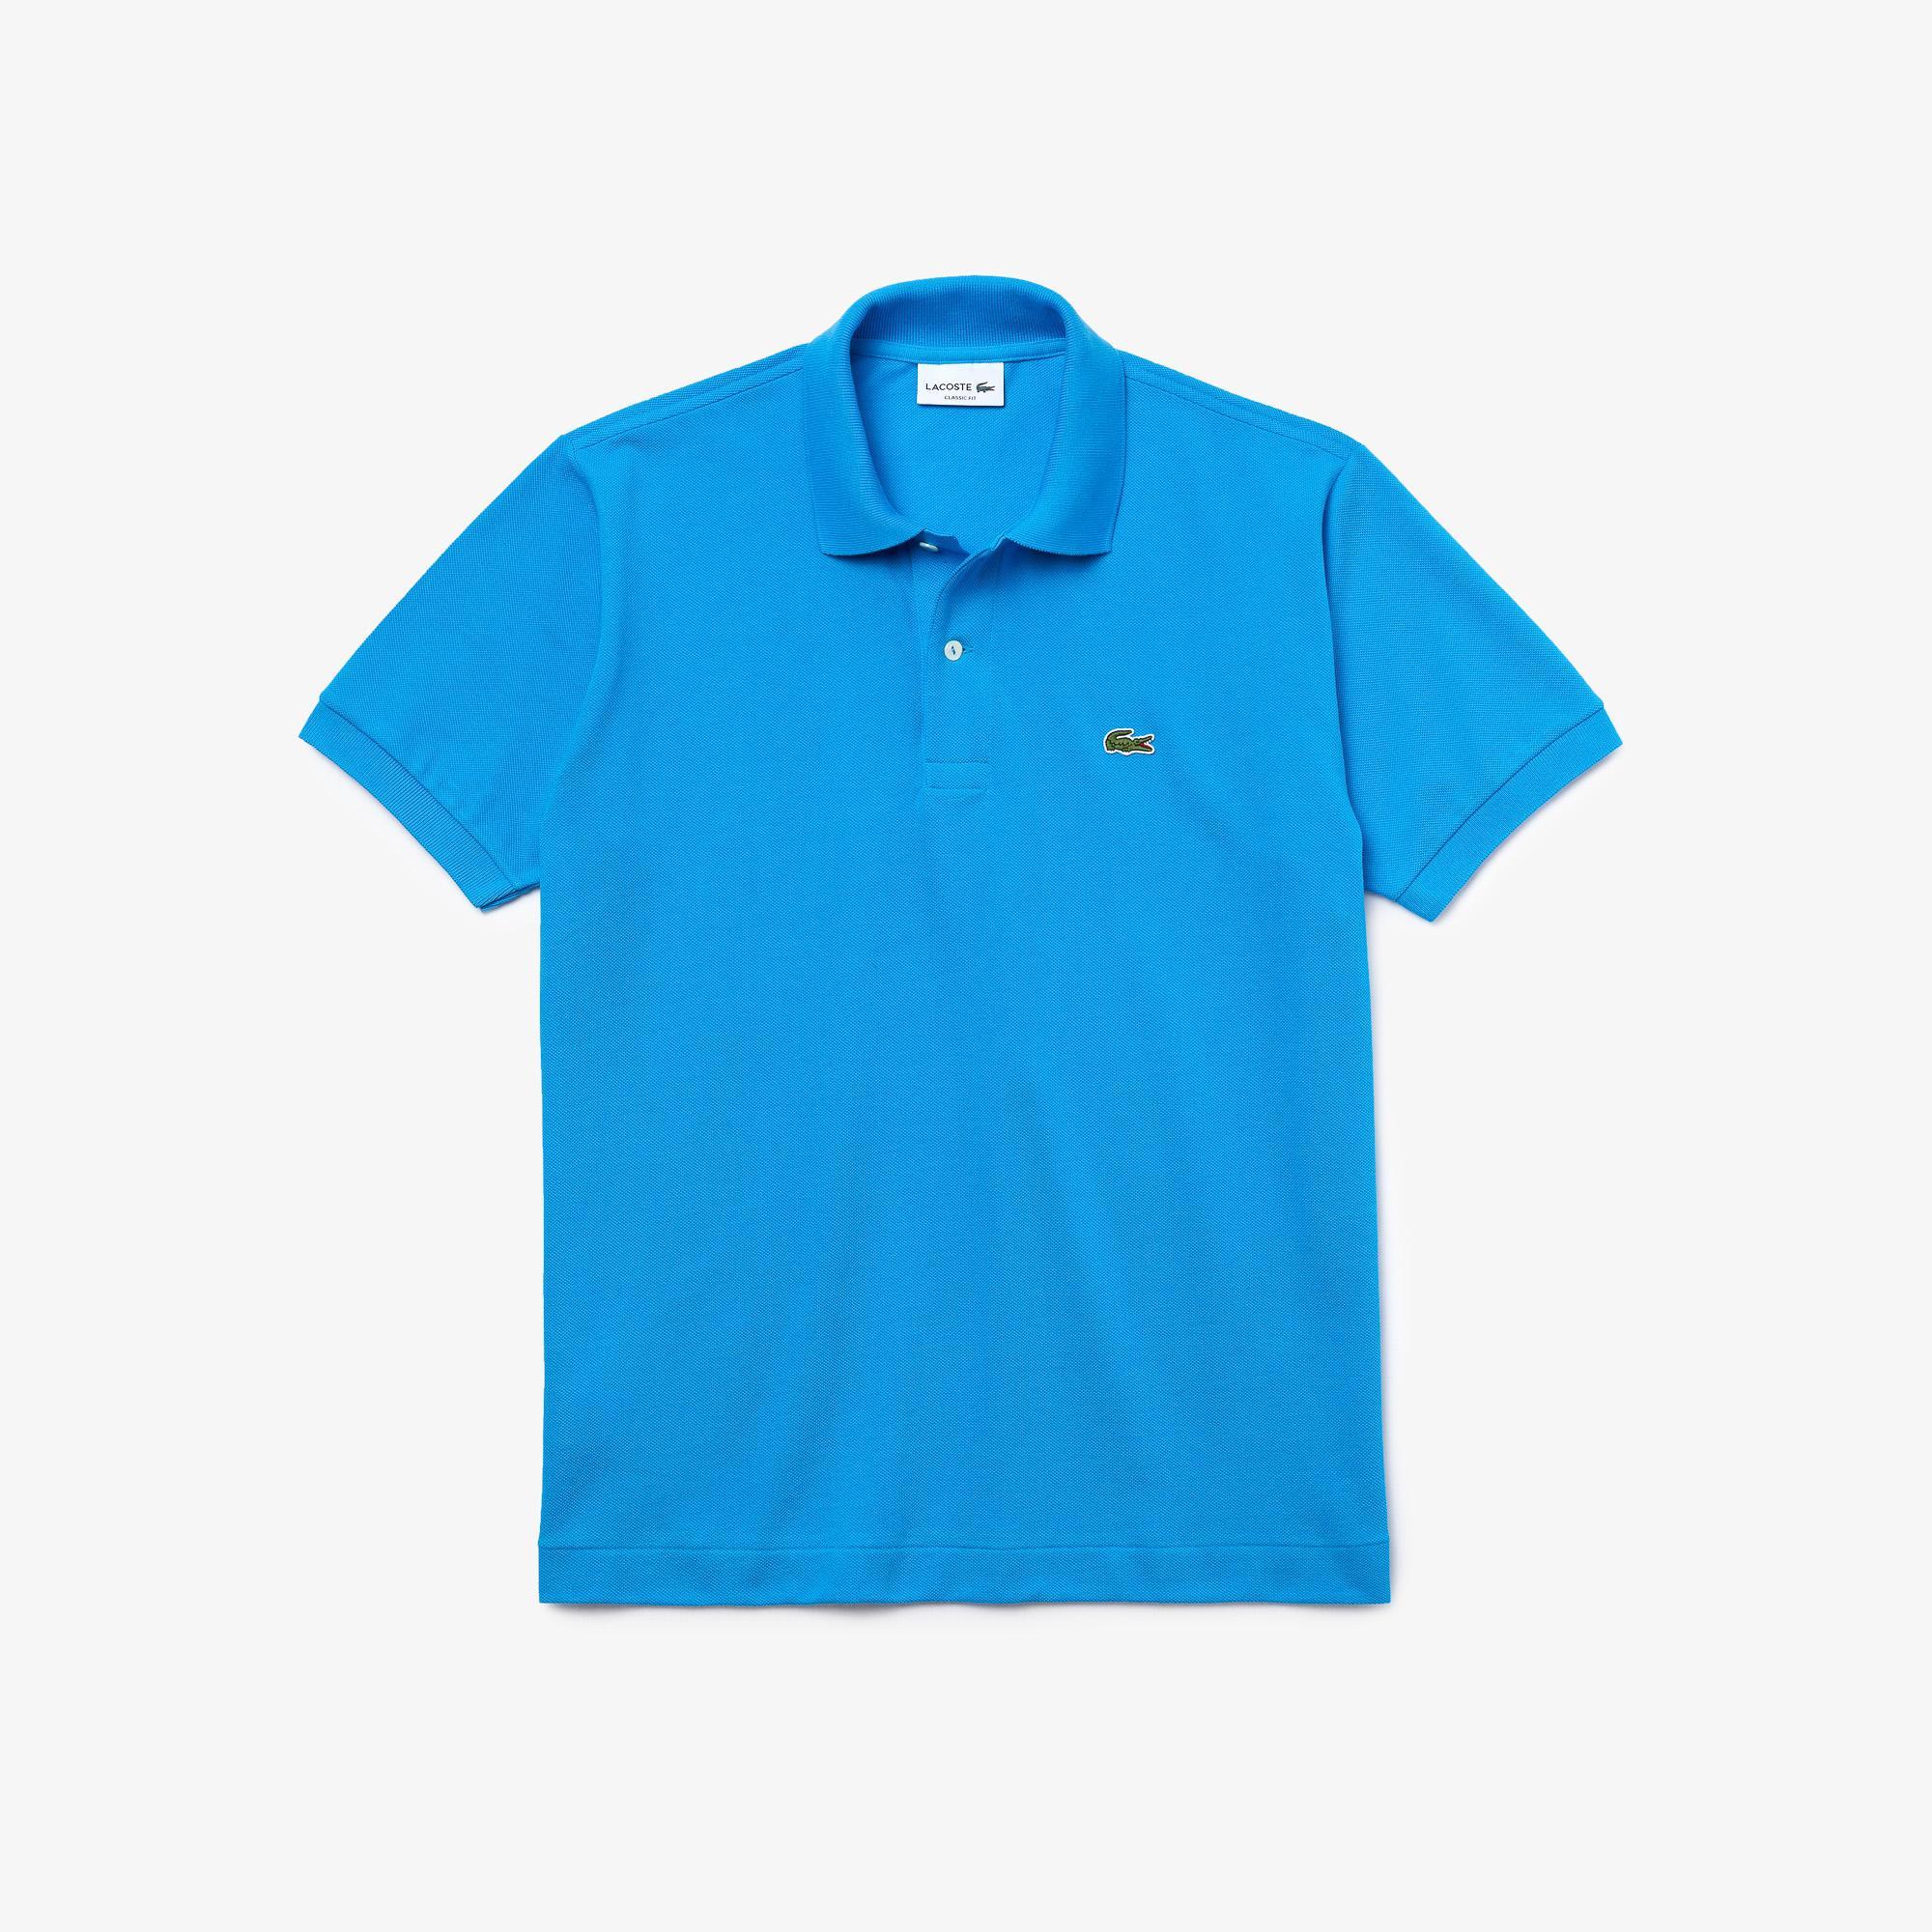 Lacoste Erkek Klasik Fit L1212 Mavi Polo